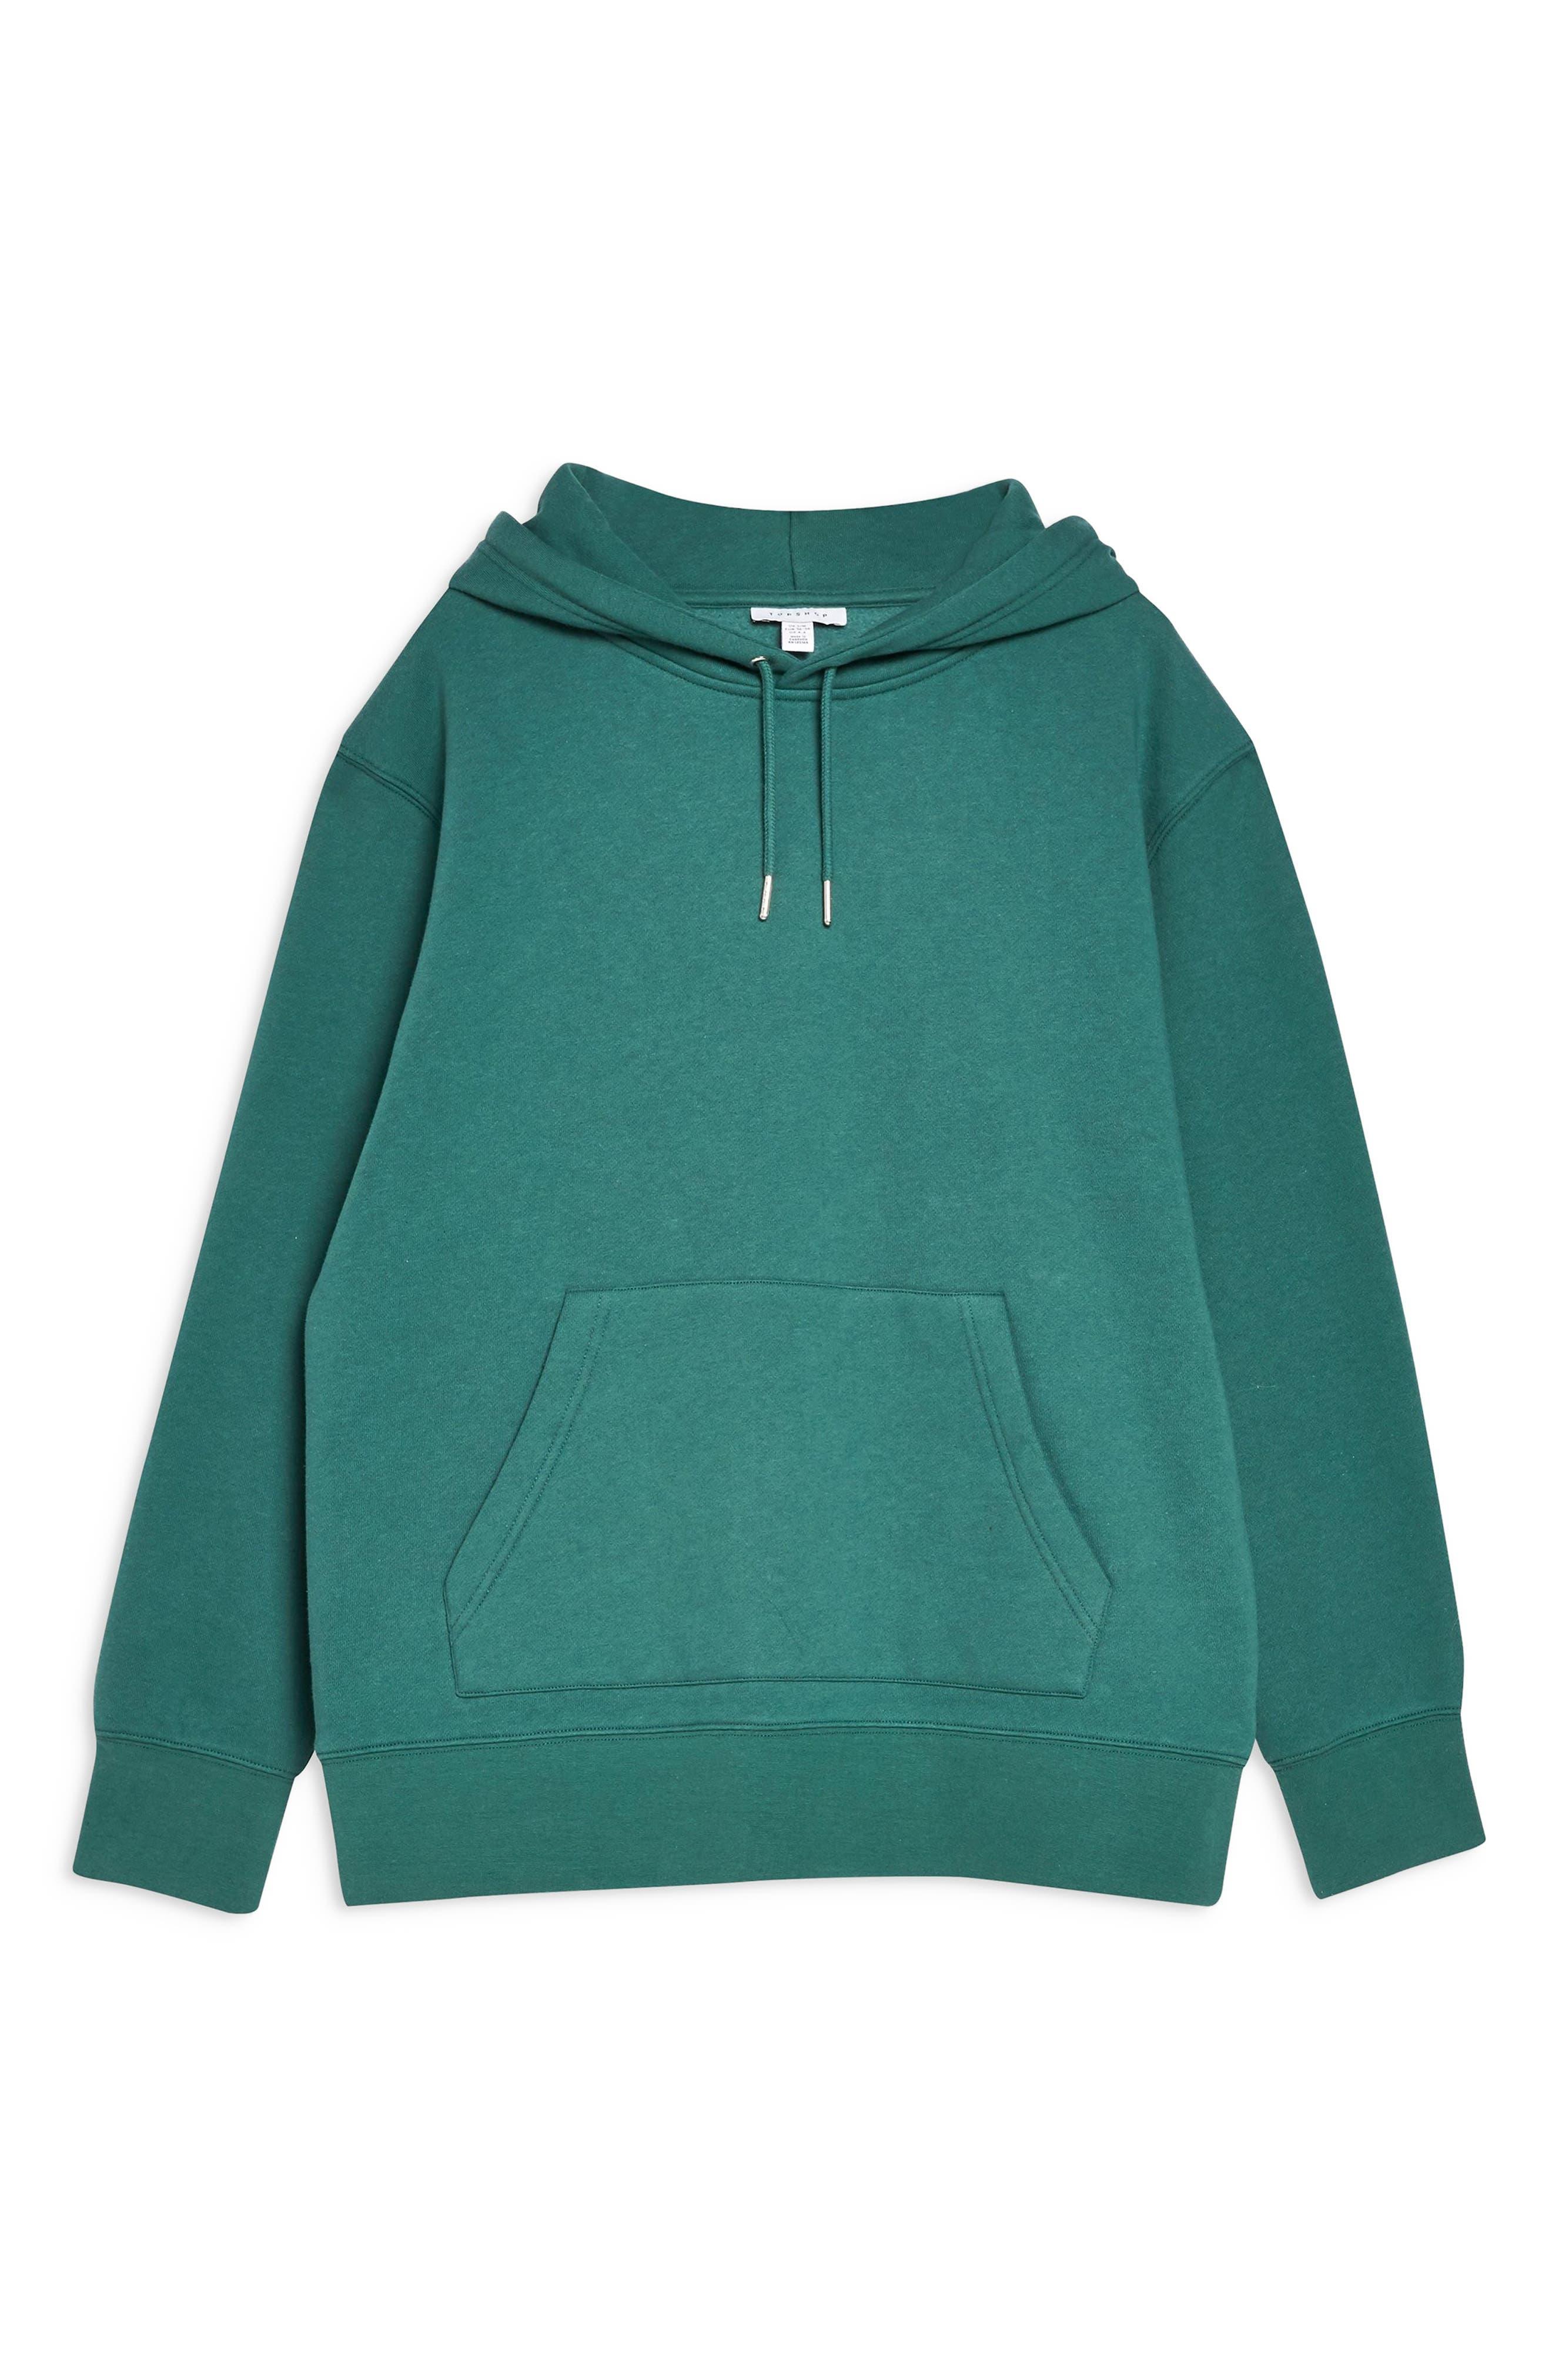 Women's Nordstrom Women's amp; Sweatshirts Sweatshirts Hoodies Bw1qnZgx